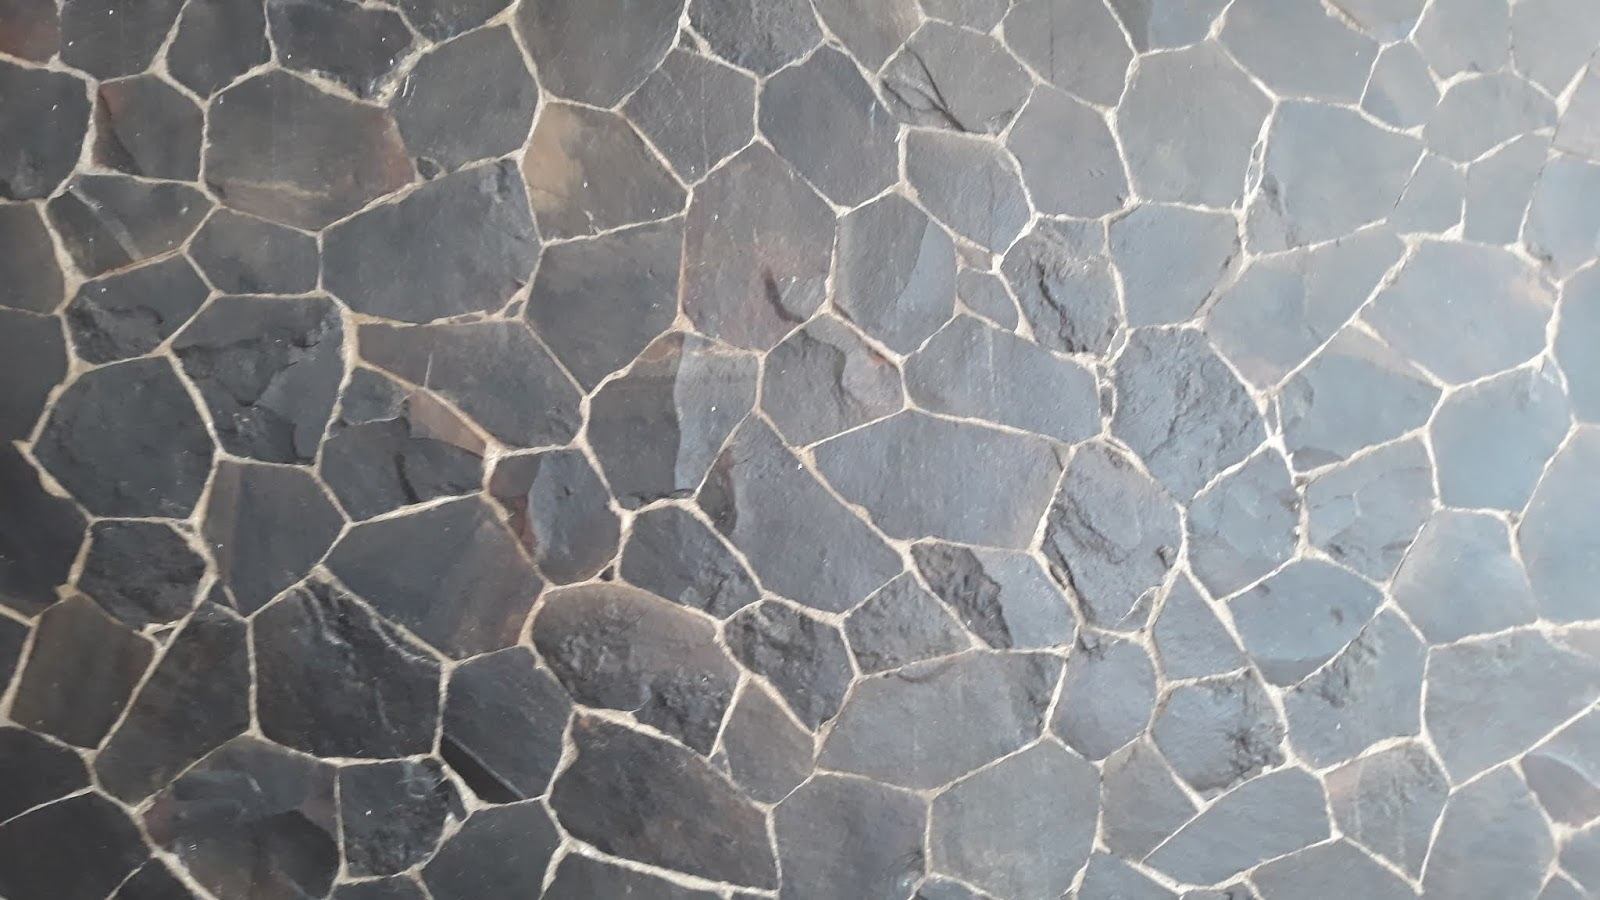 Jual Batu Alam Templek Paling Murah Di 2019 Jual Batu